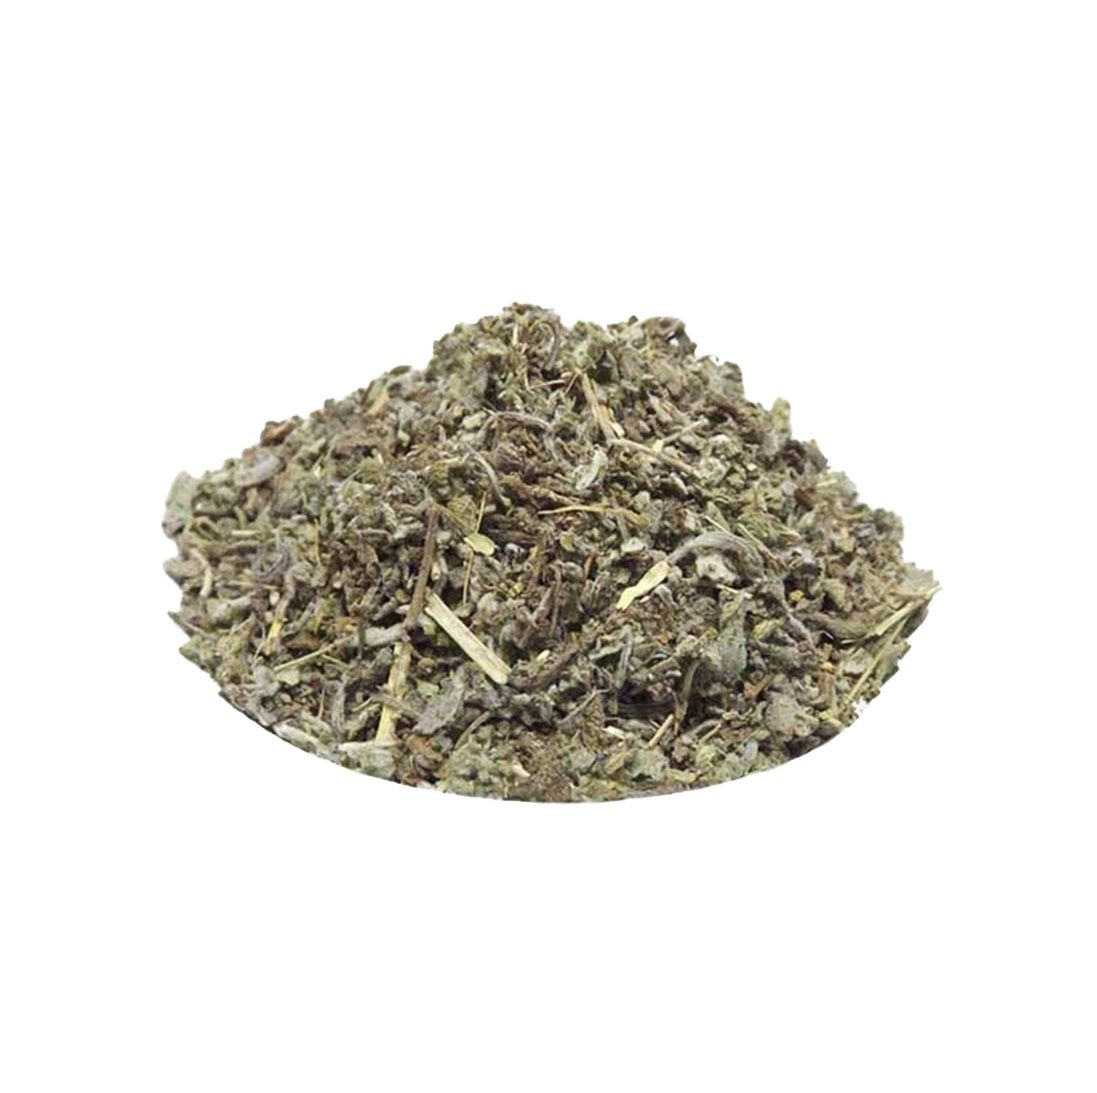 Salvia 100g